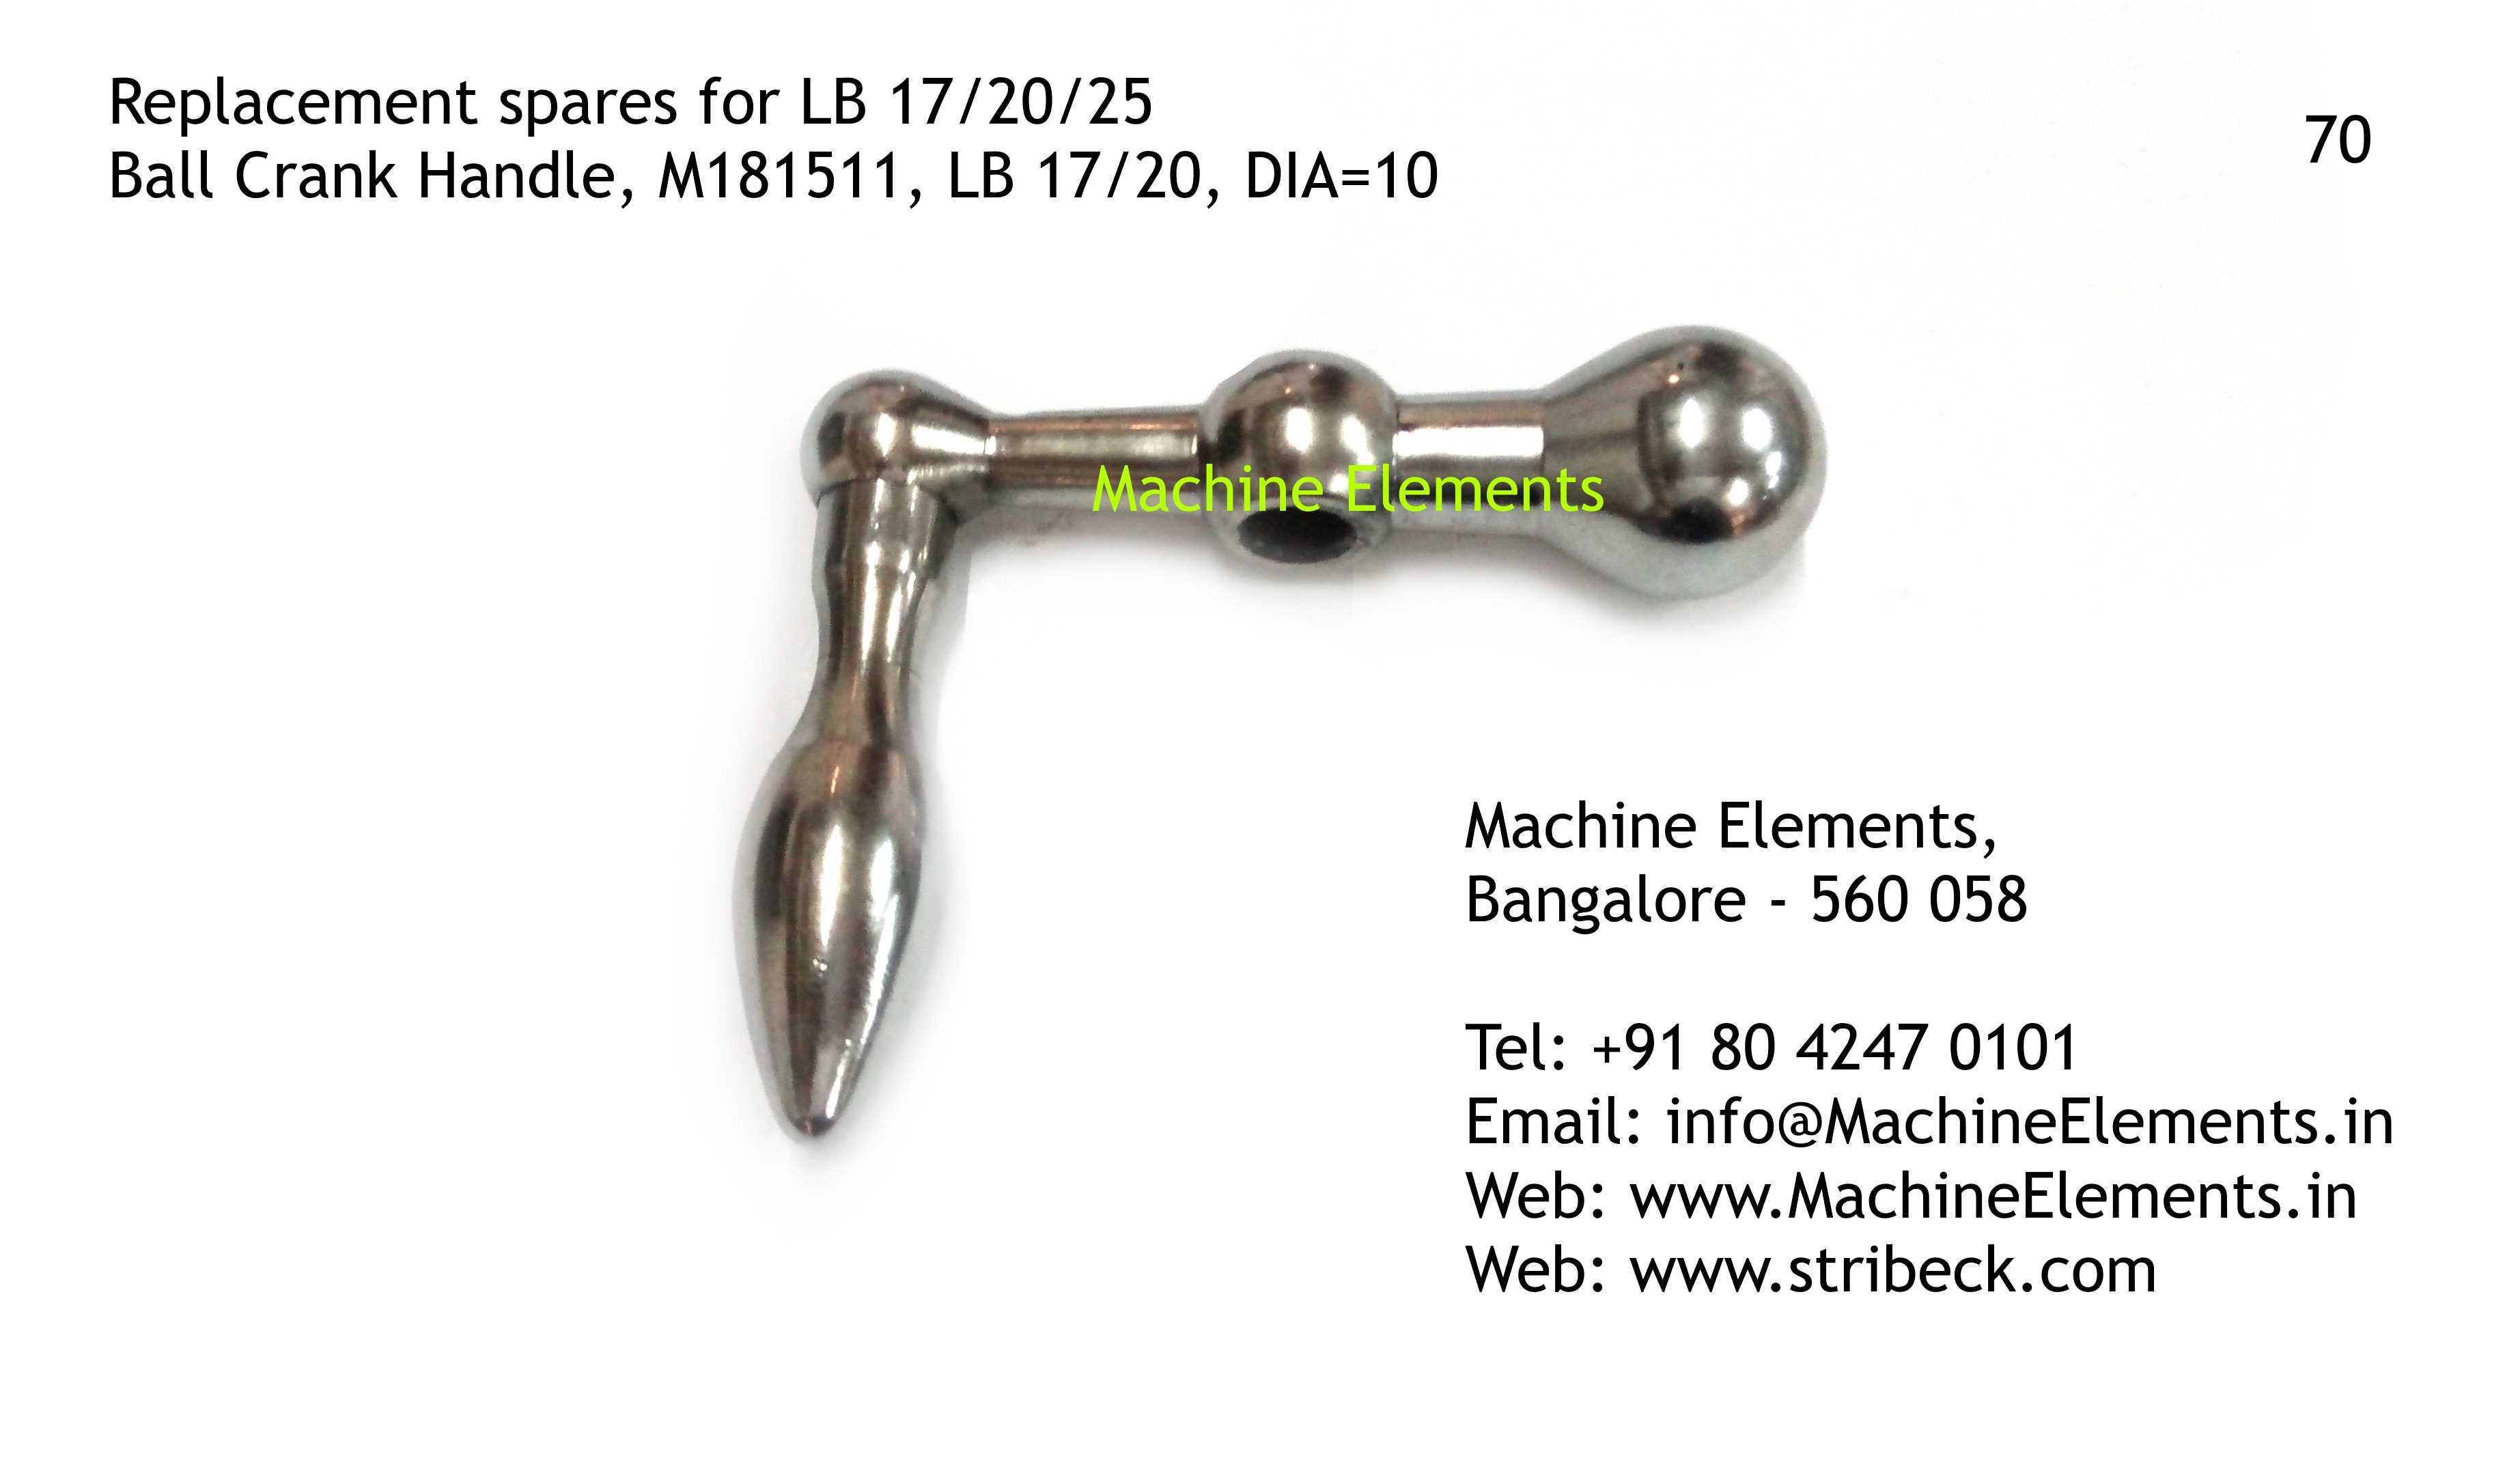 Ball Crank Handle, M181511